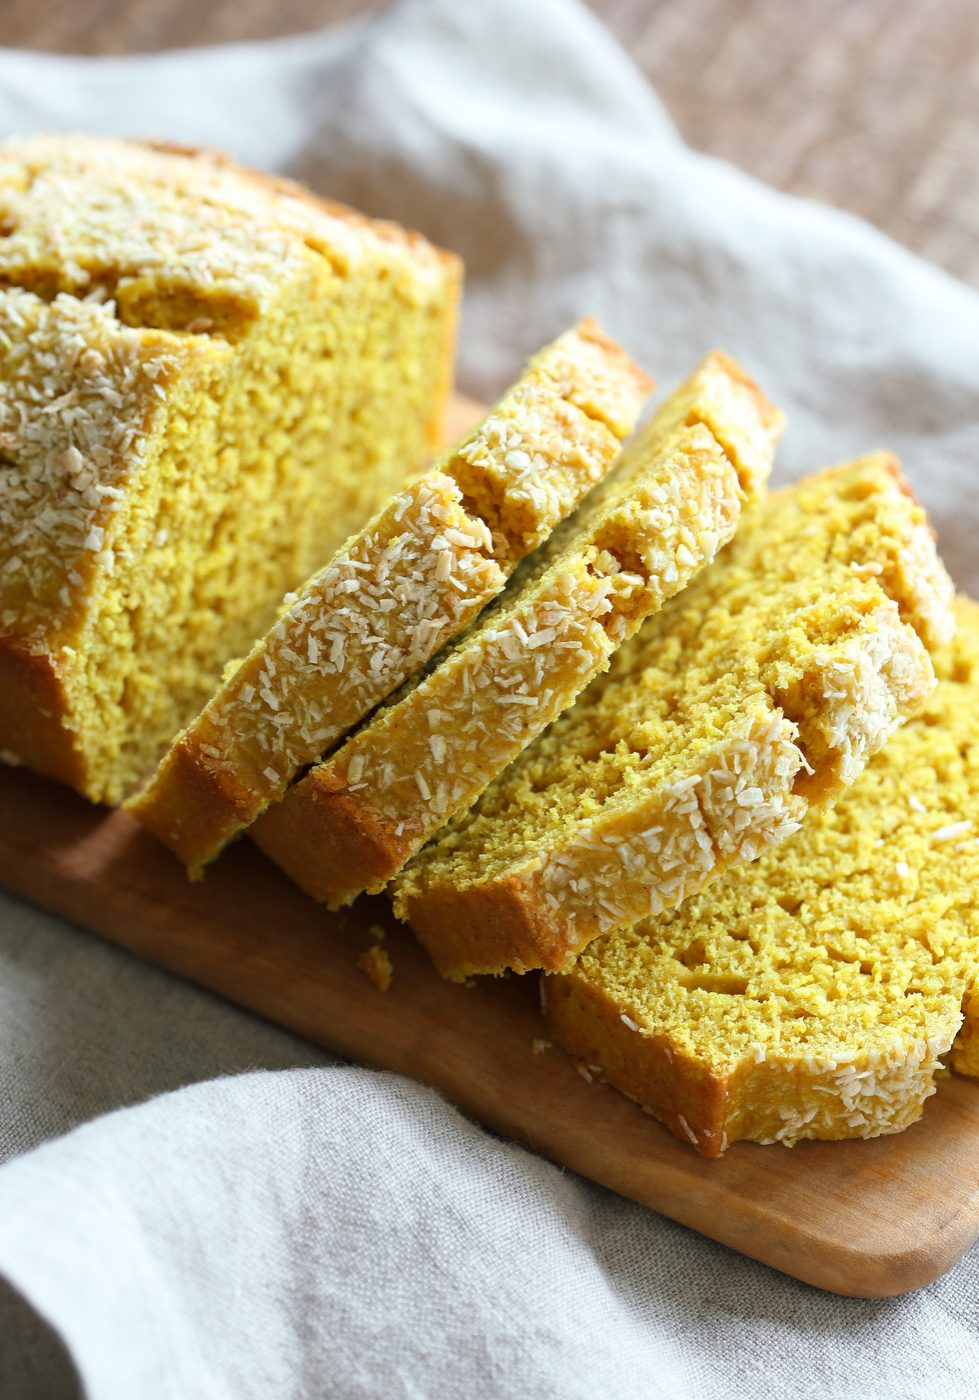 Vegan-coconut-turmeric-bread-veganricha-7223